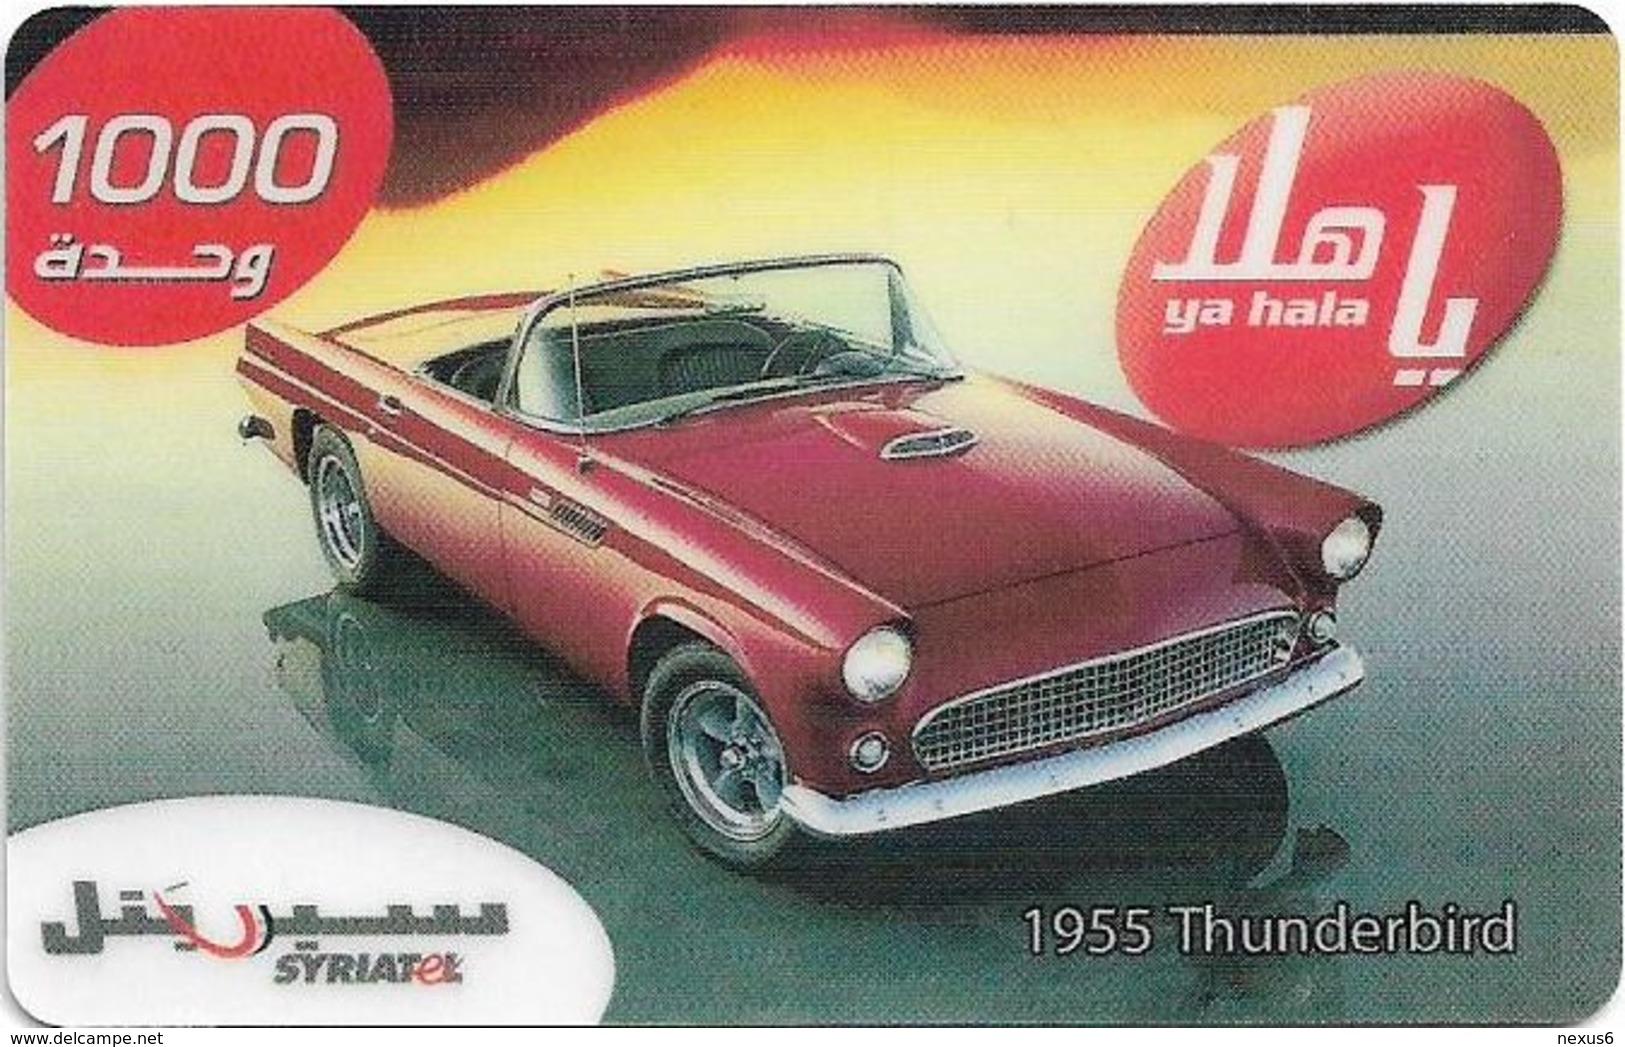 Syria - Syriatel - Cars - 1955 Thunderbird, Exp. 31.12.2008, Prepaid 1000U, Used - Syria